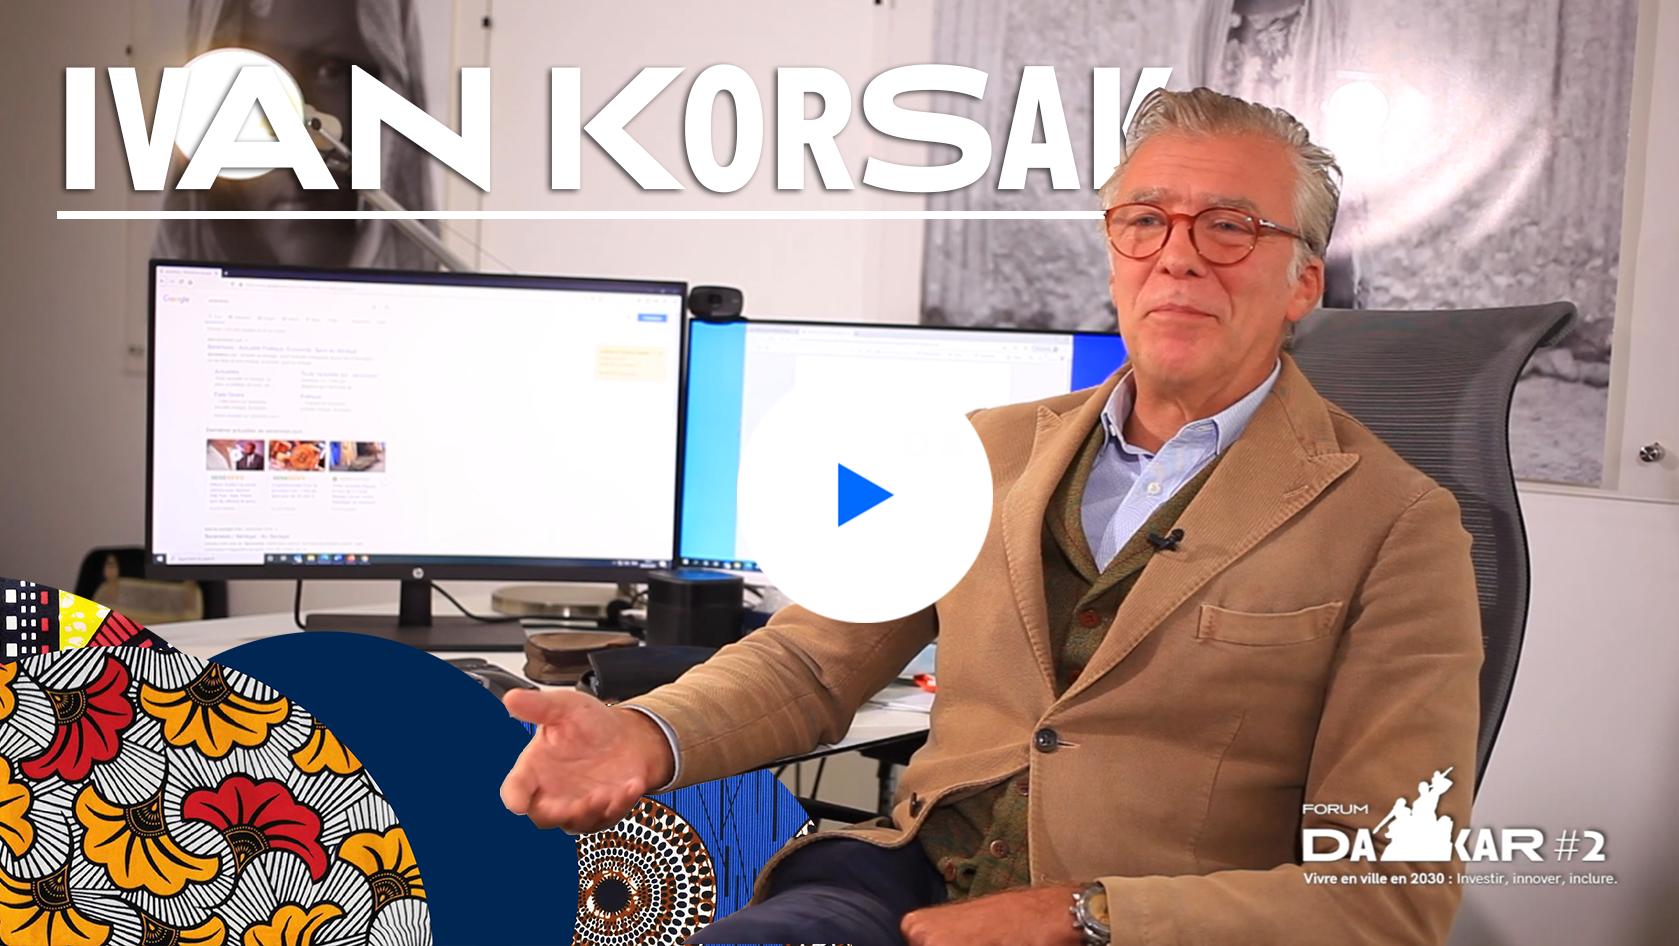 3. Ivan Korsak